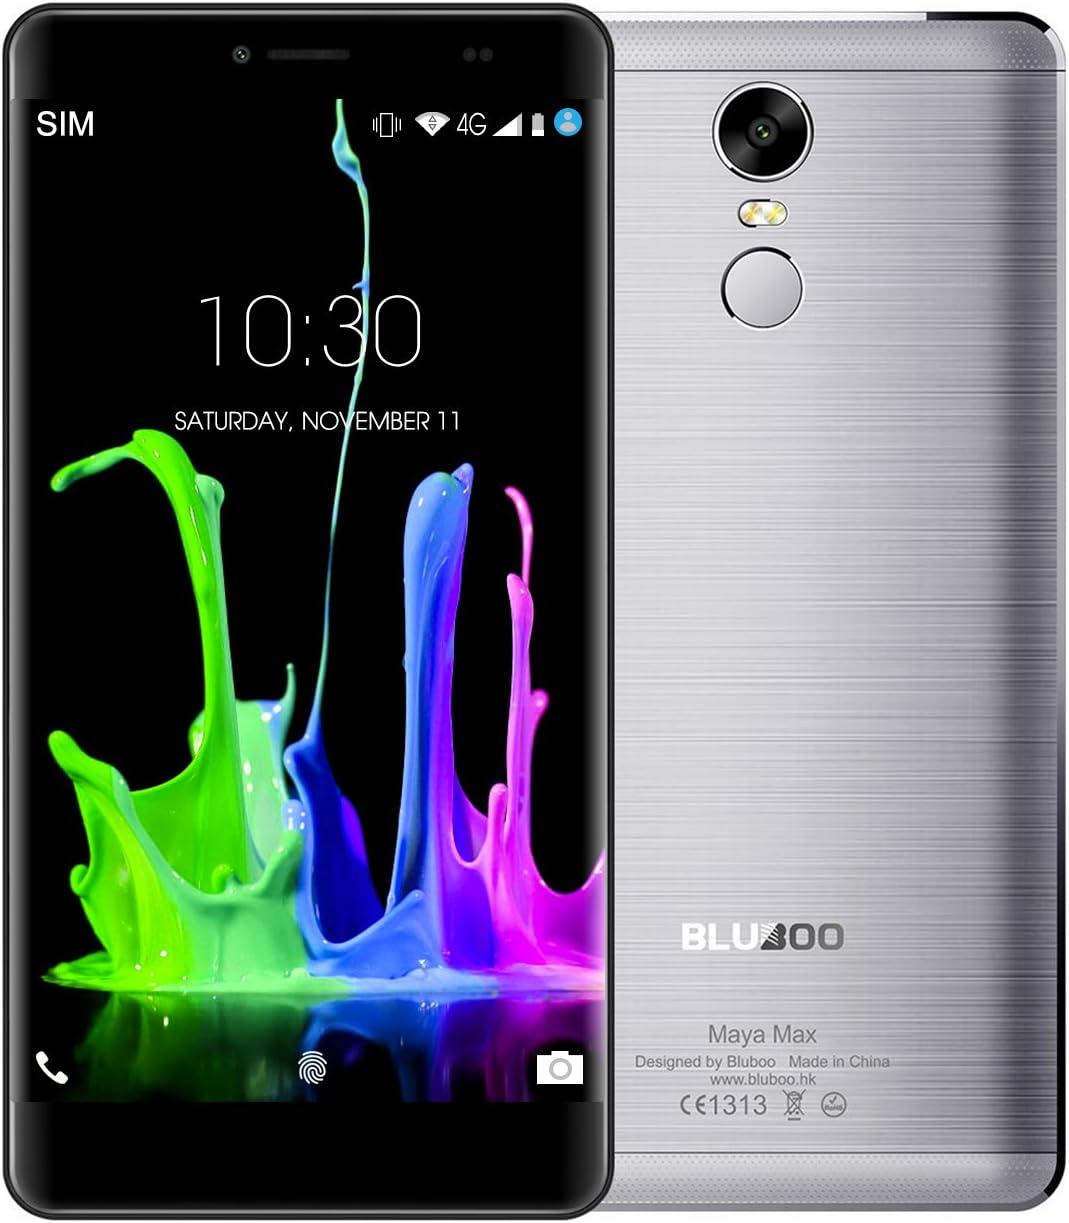 Moviles Libres Baratos, BLUBOO Maya Max 6.0 Pulgadas 3GB RAM 32GB ...